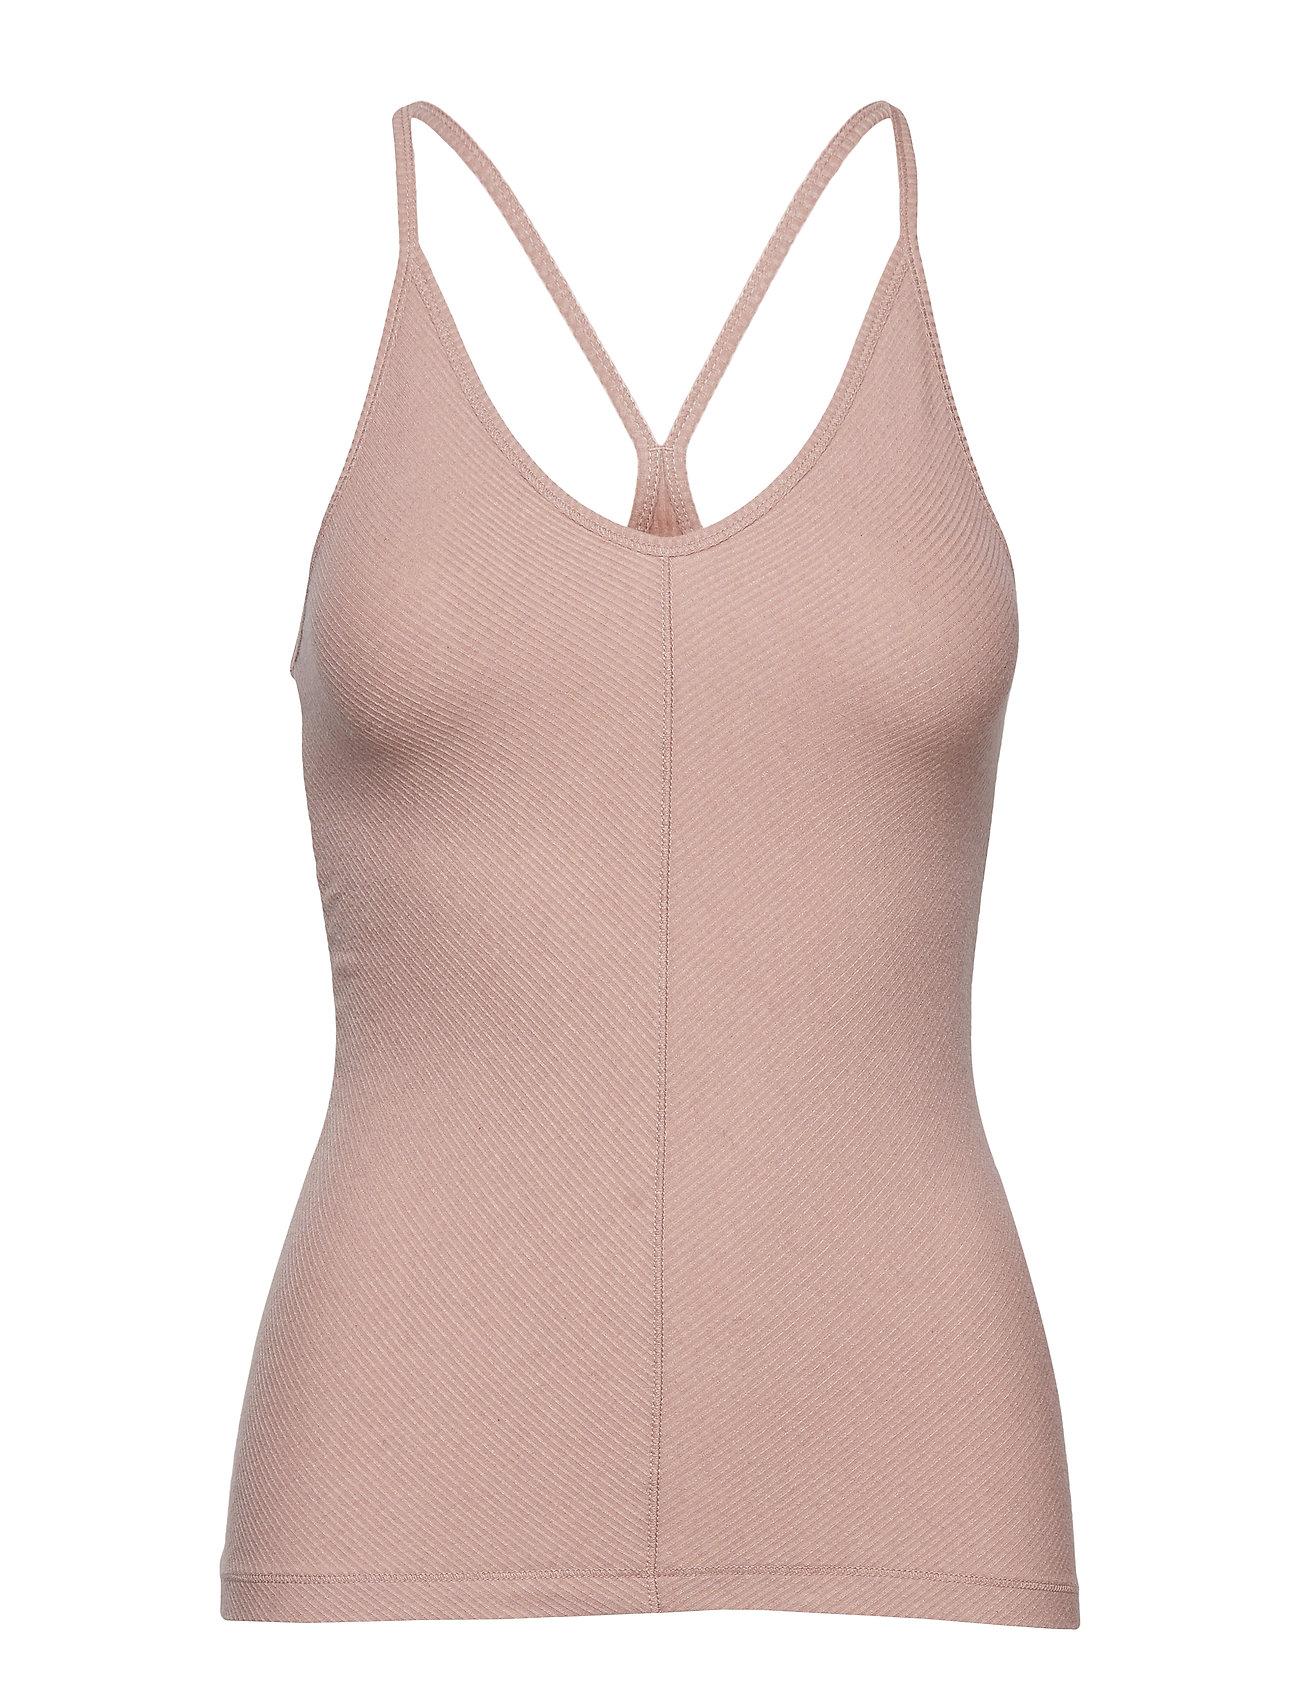 Filippa K Soft Sport Silky Jersey Strap Top